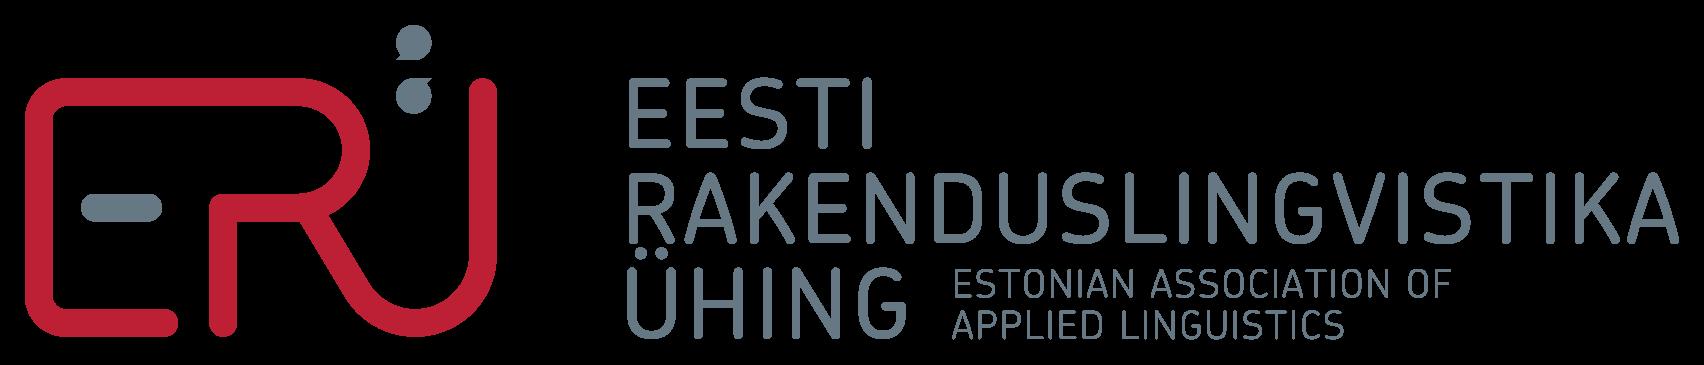 ERU_logo_2016